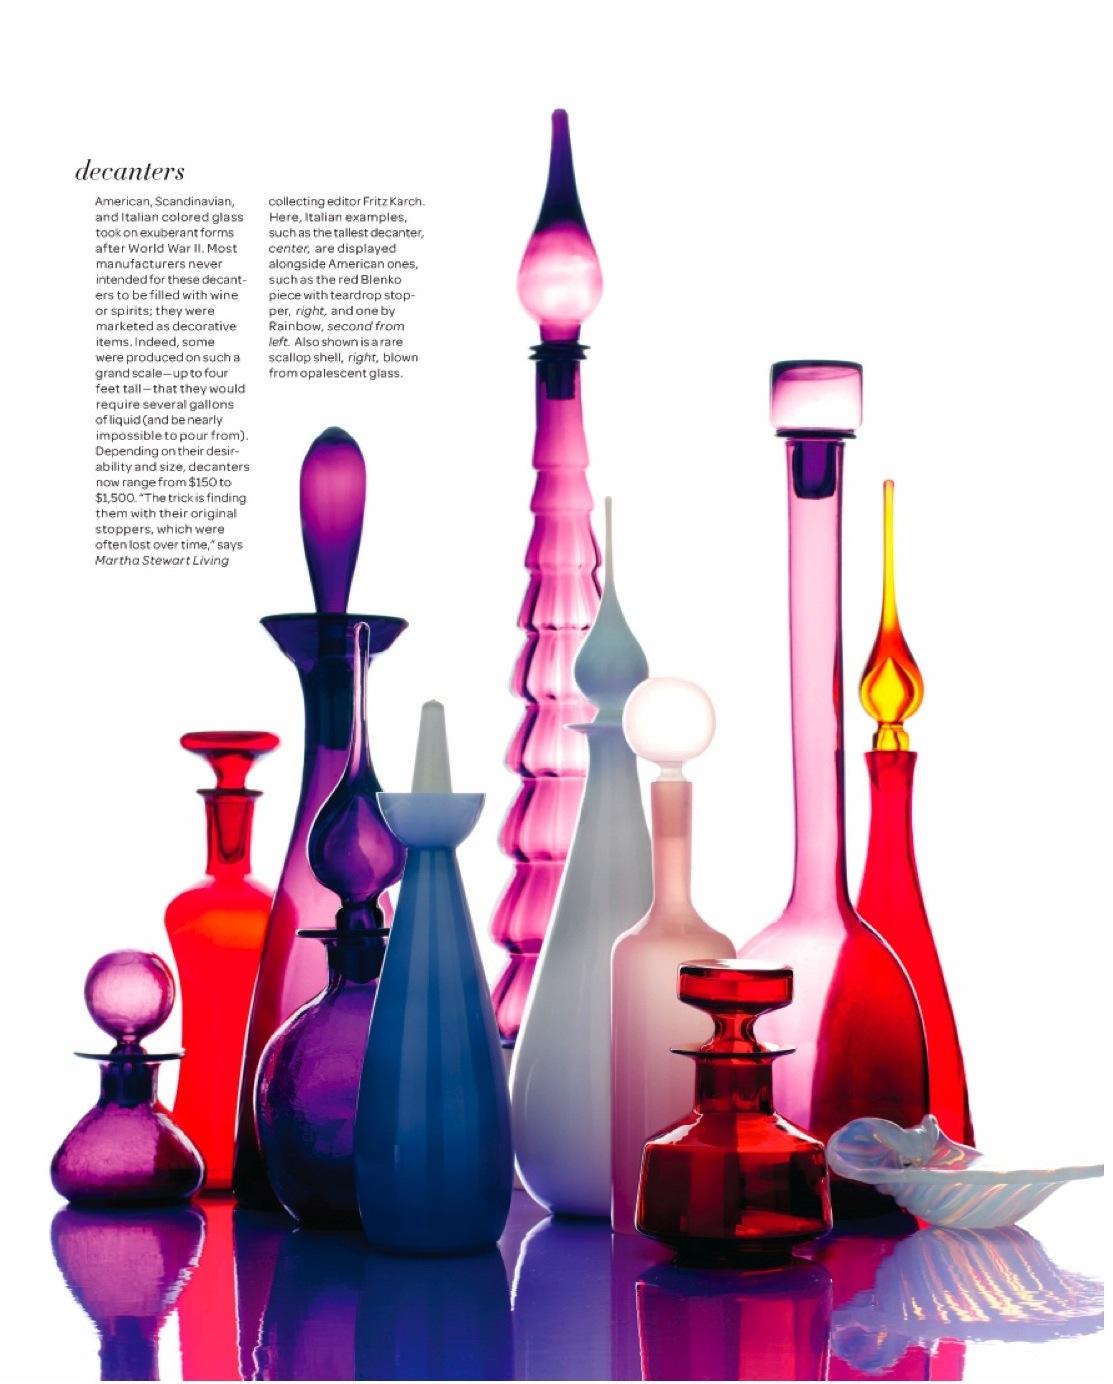 Glass vase with stopper vases sale for Purple wine bottles for sale